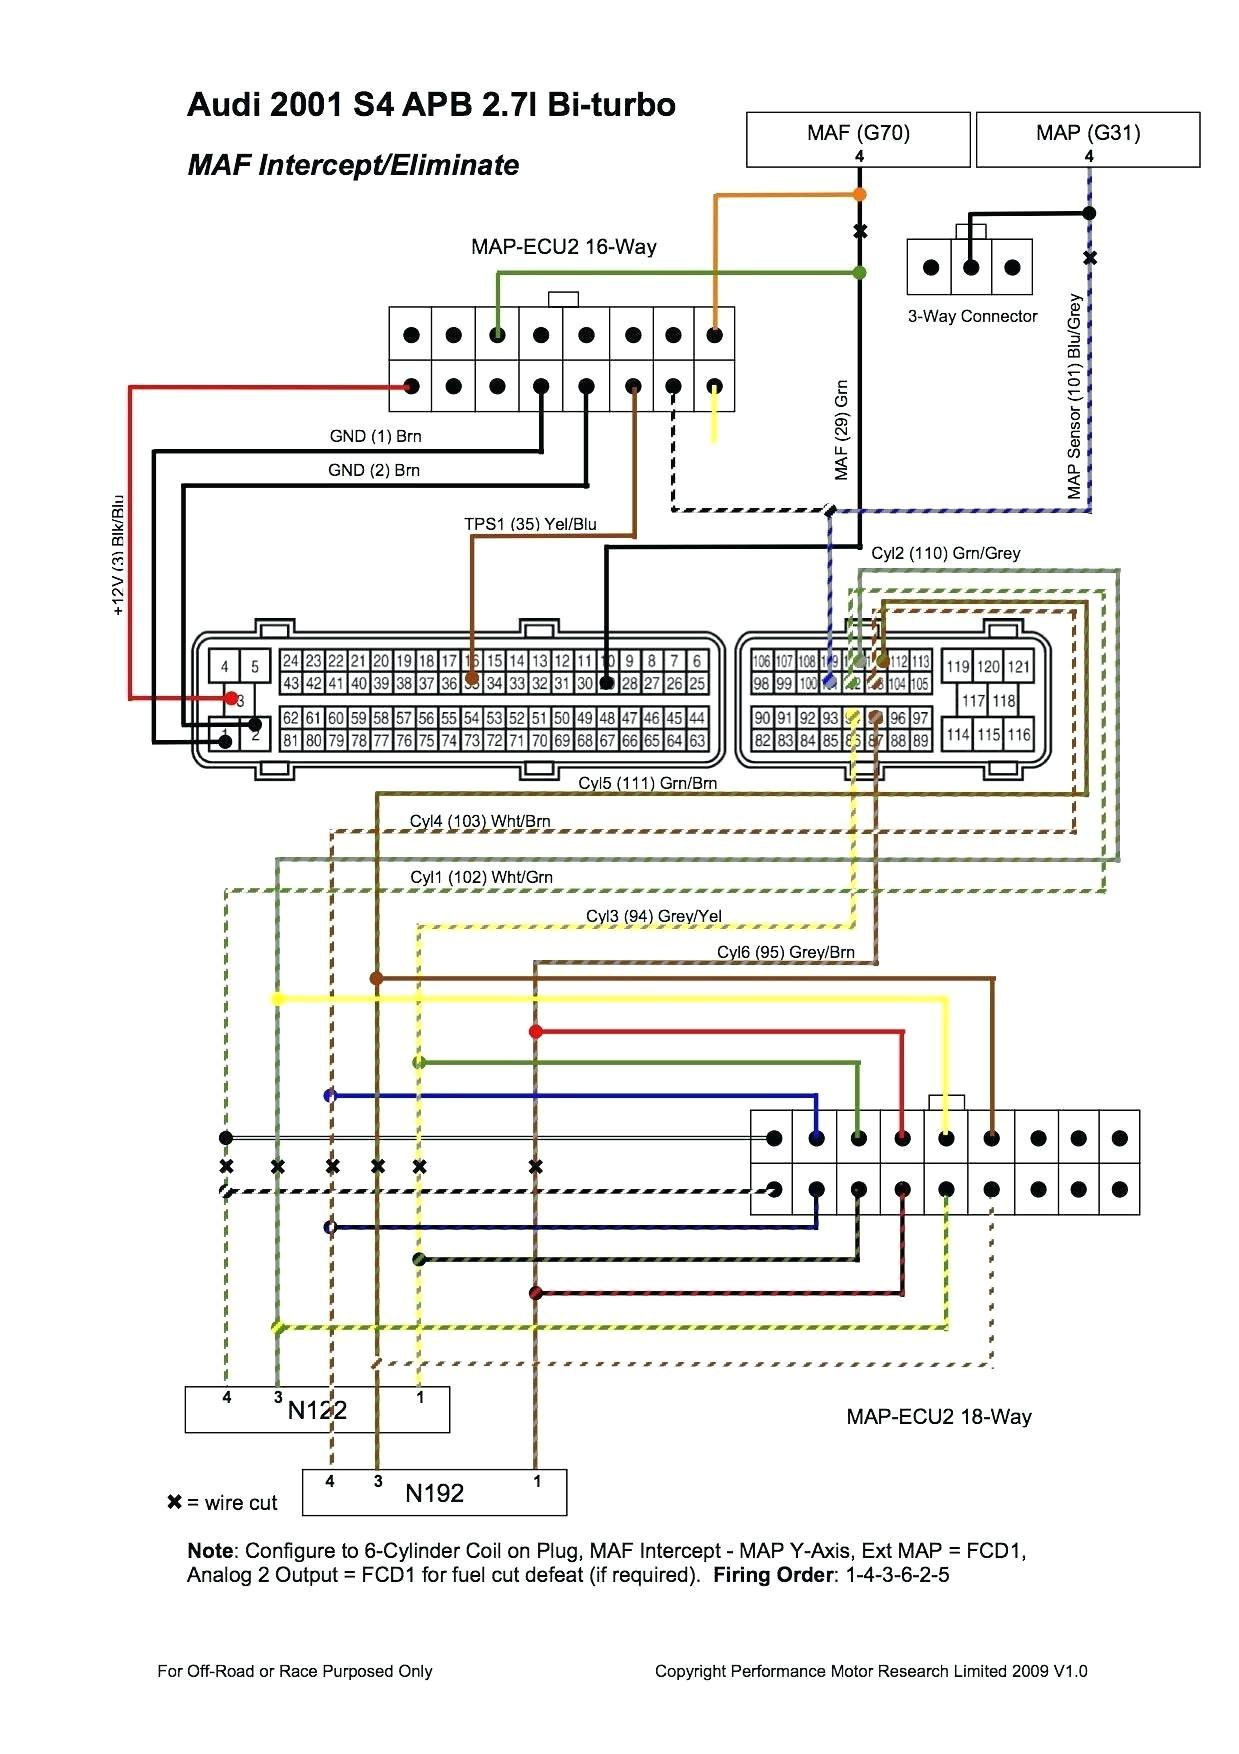 99 dodge wiring diagram wiring diagram fascinating99 ram wiring diagram wiring diagram today 99 dodge ram